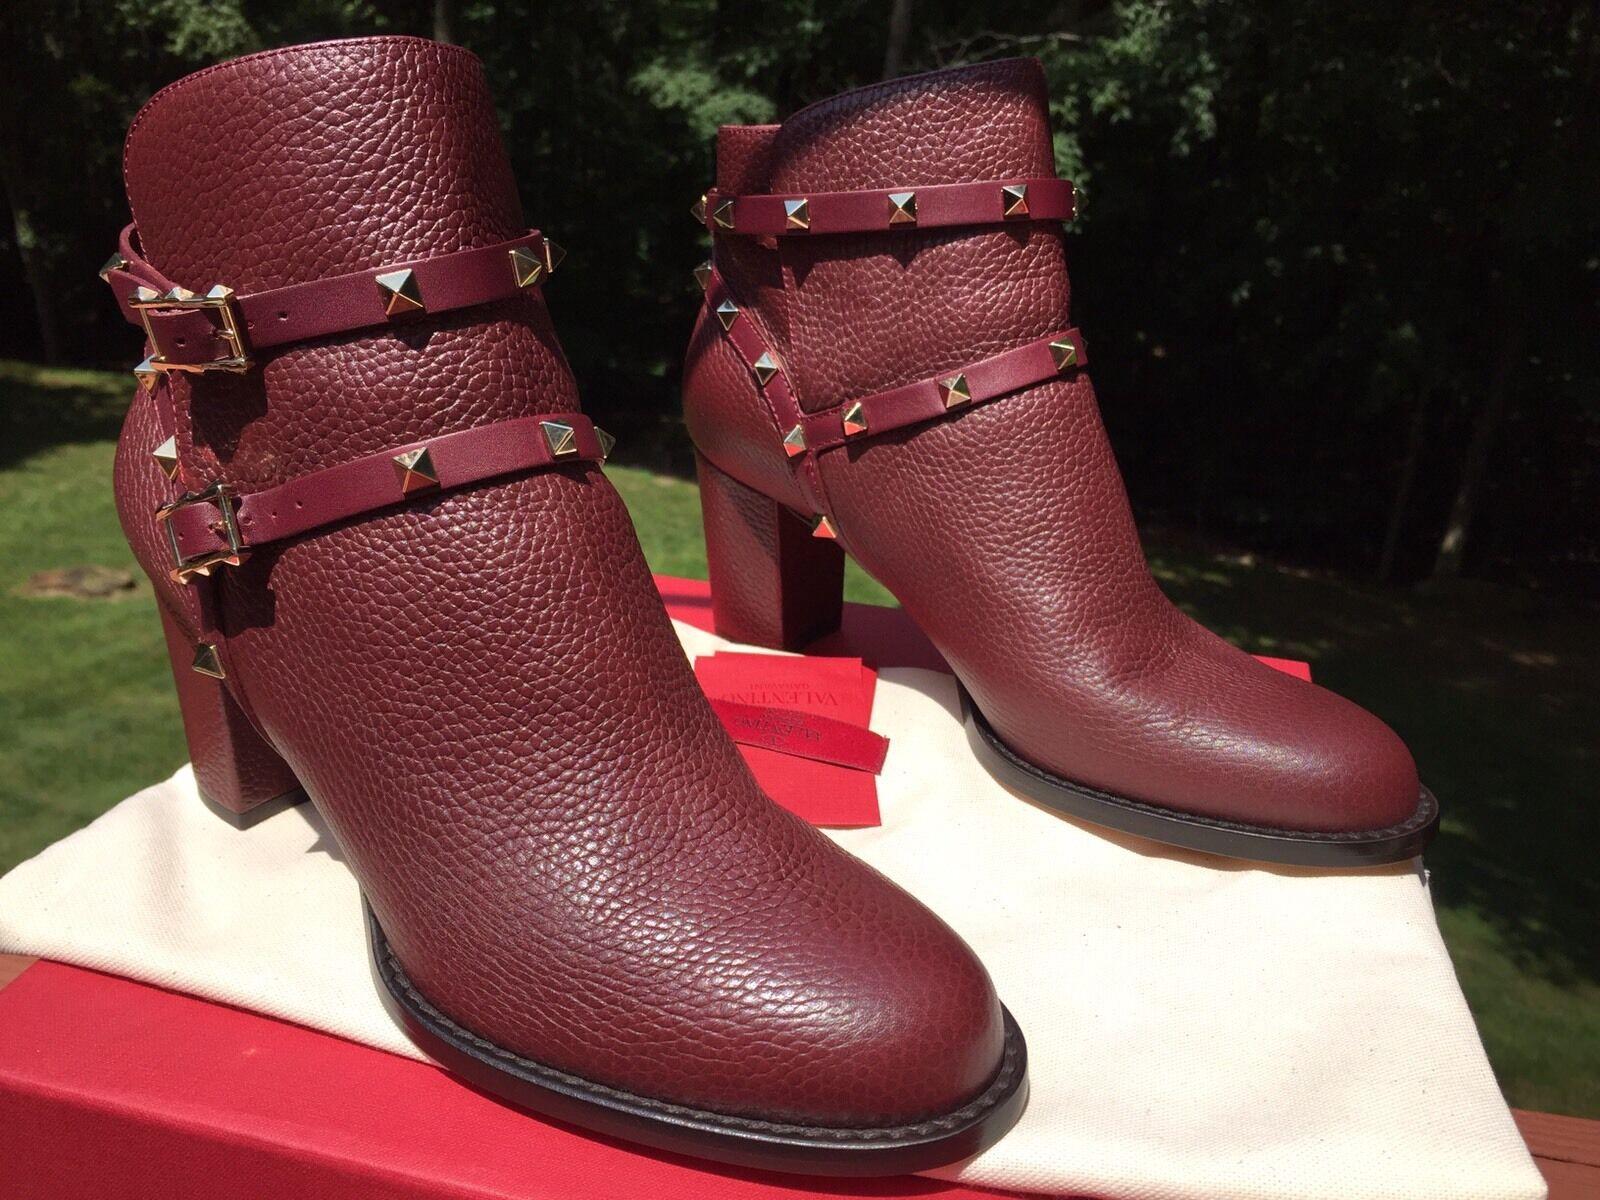 NIB 1375 Valentino Rockstud Wine Ankle City Block Heel Bootie Boot 41 11 10.5 10